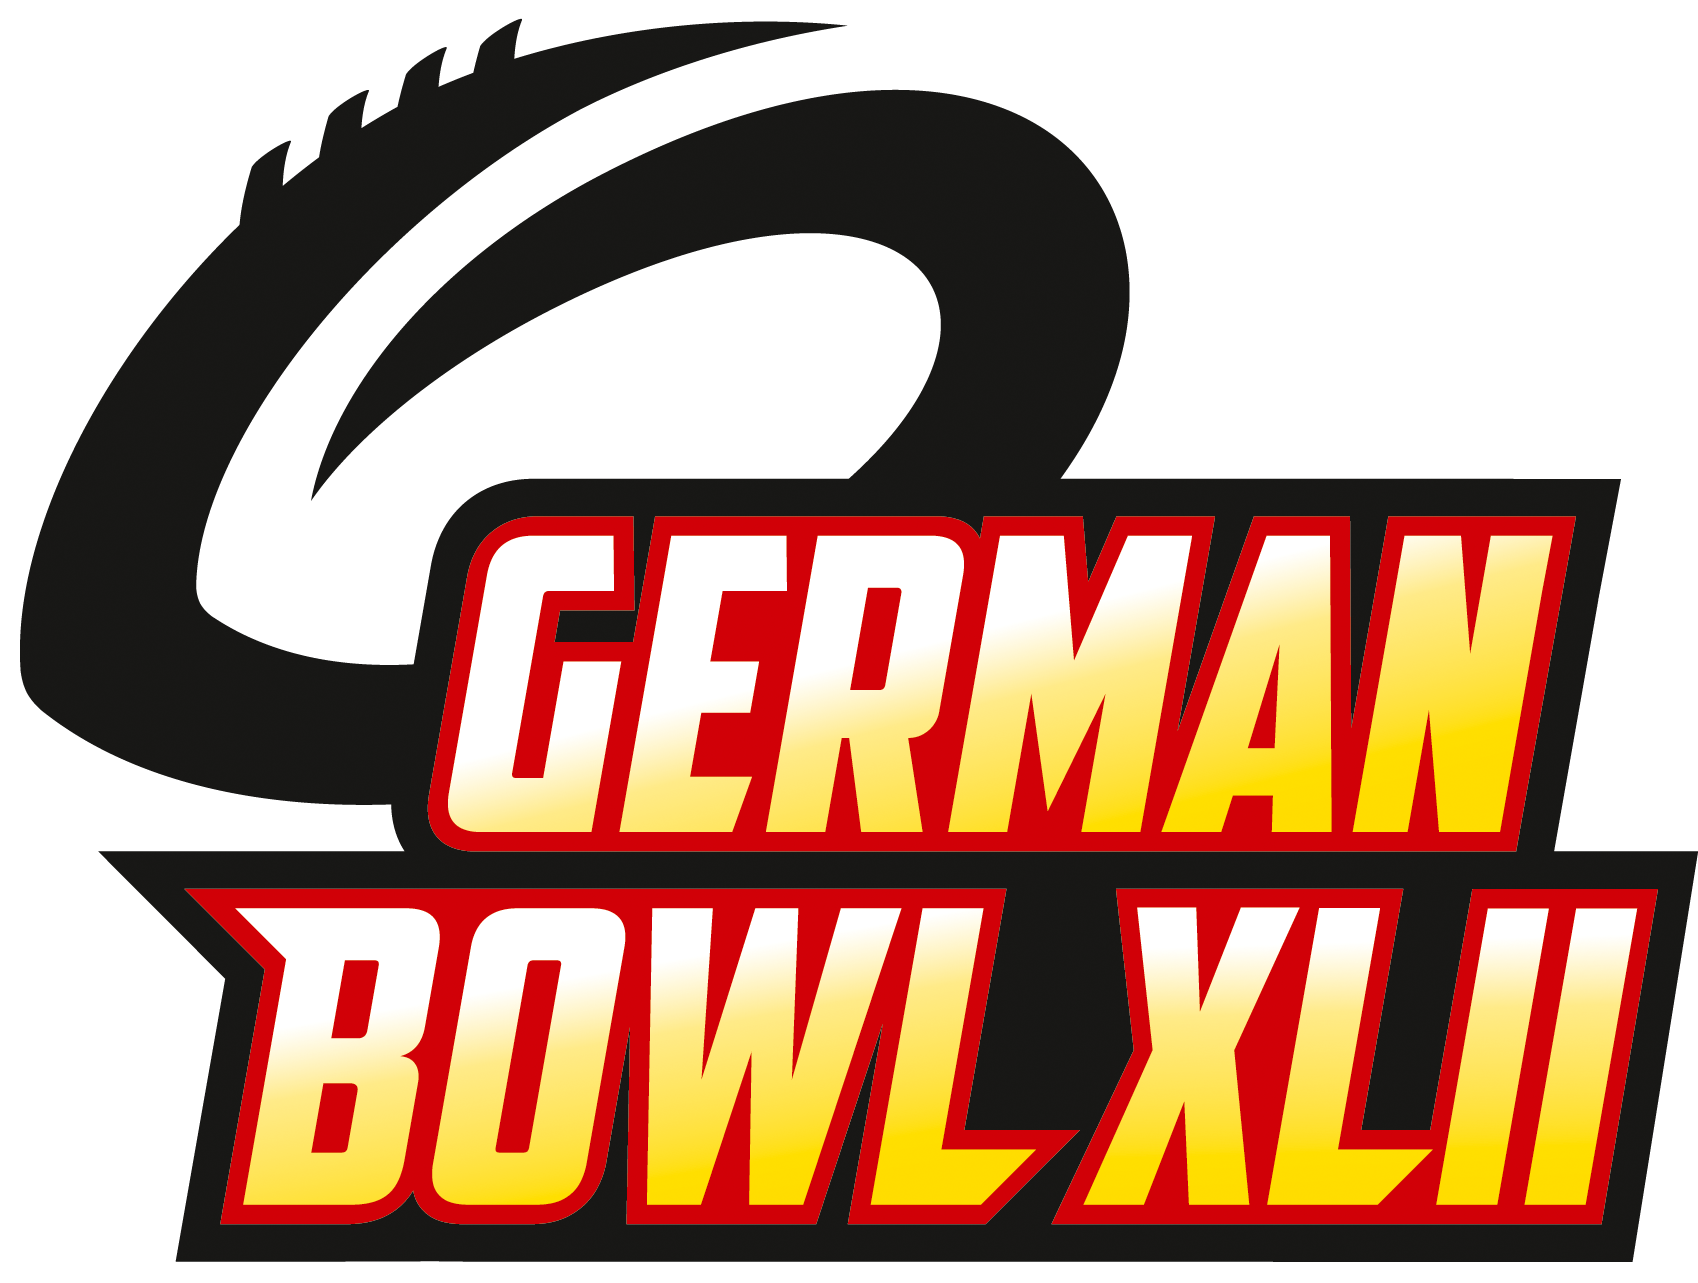 Logo_GermanbowlXLII_transparent